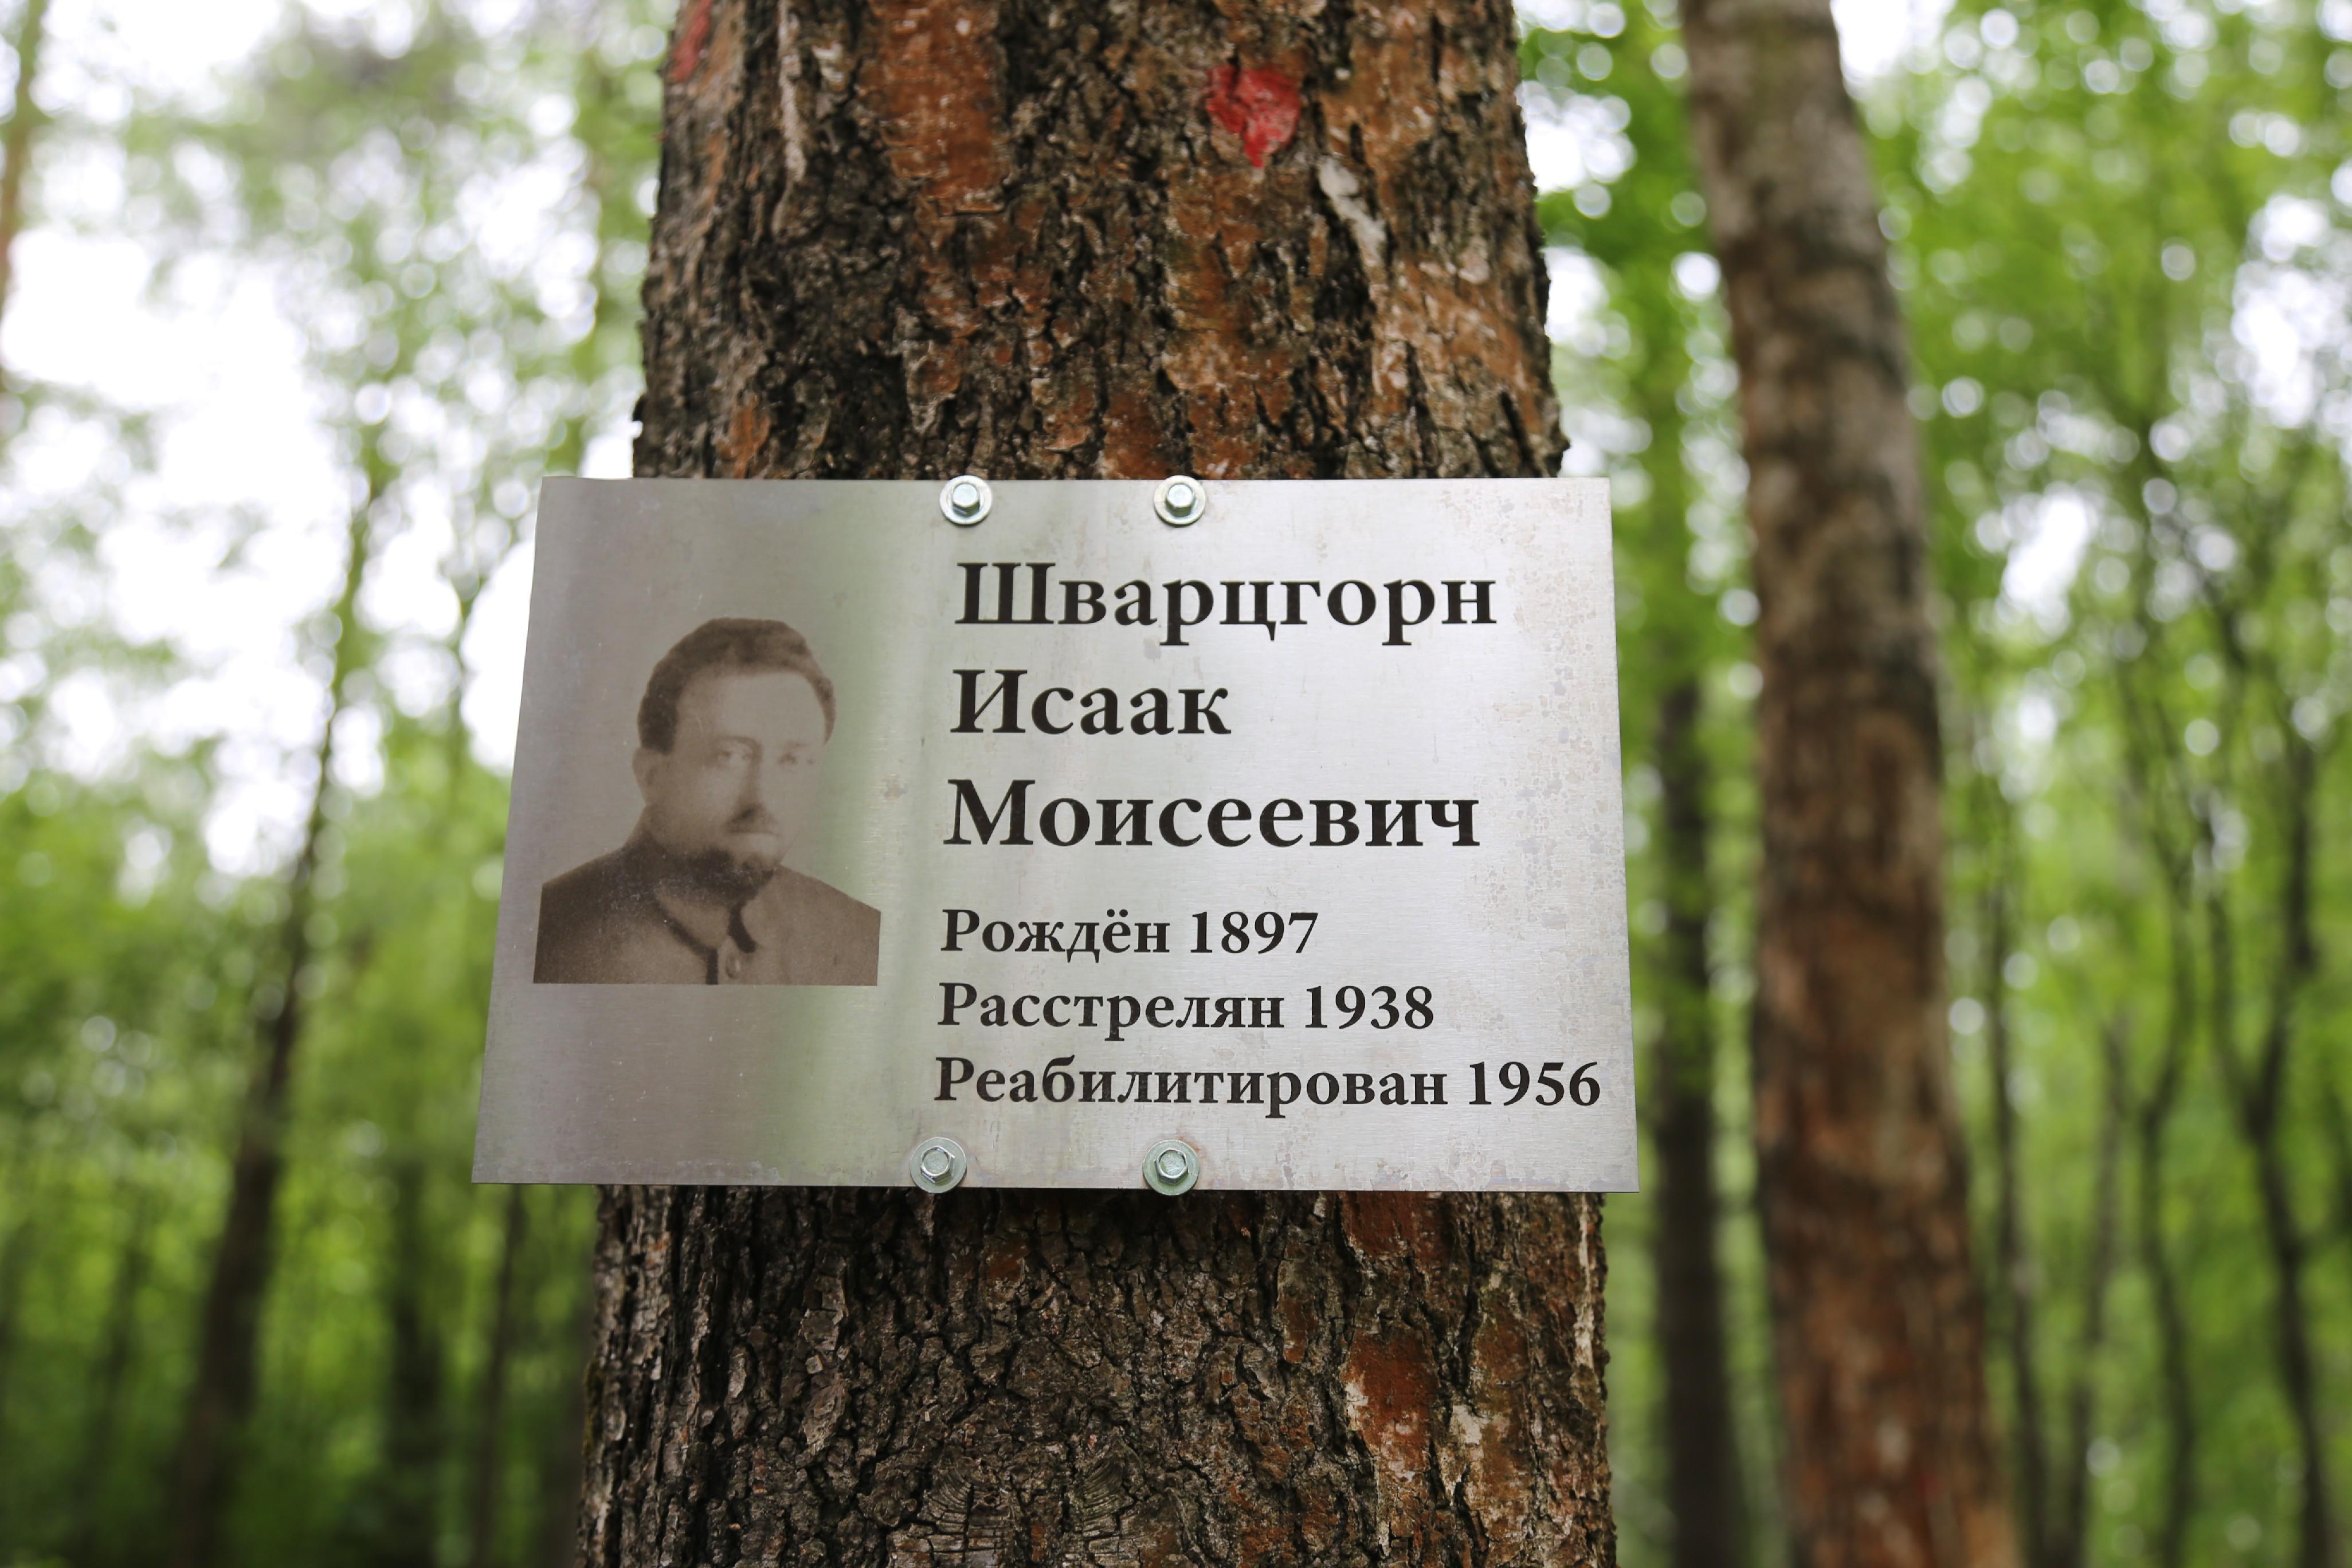 Памятная табличка И.М. Шварцгорну. Фото 07.06.2018